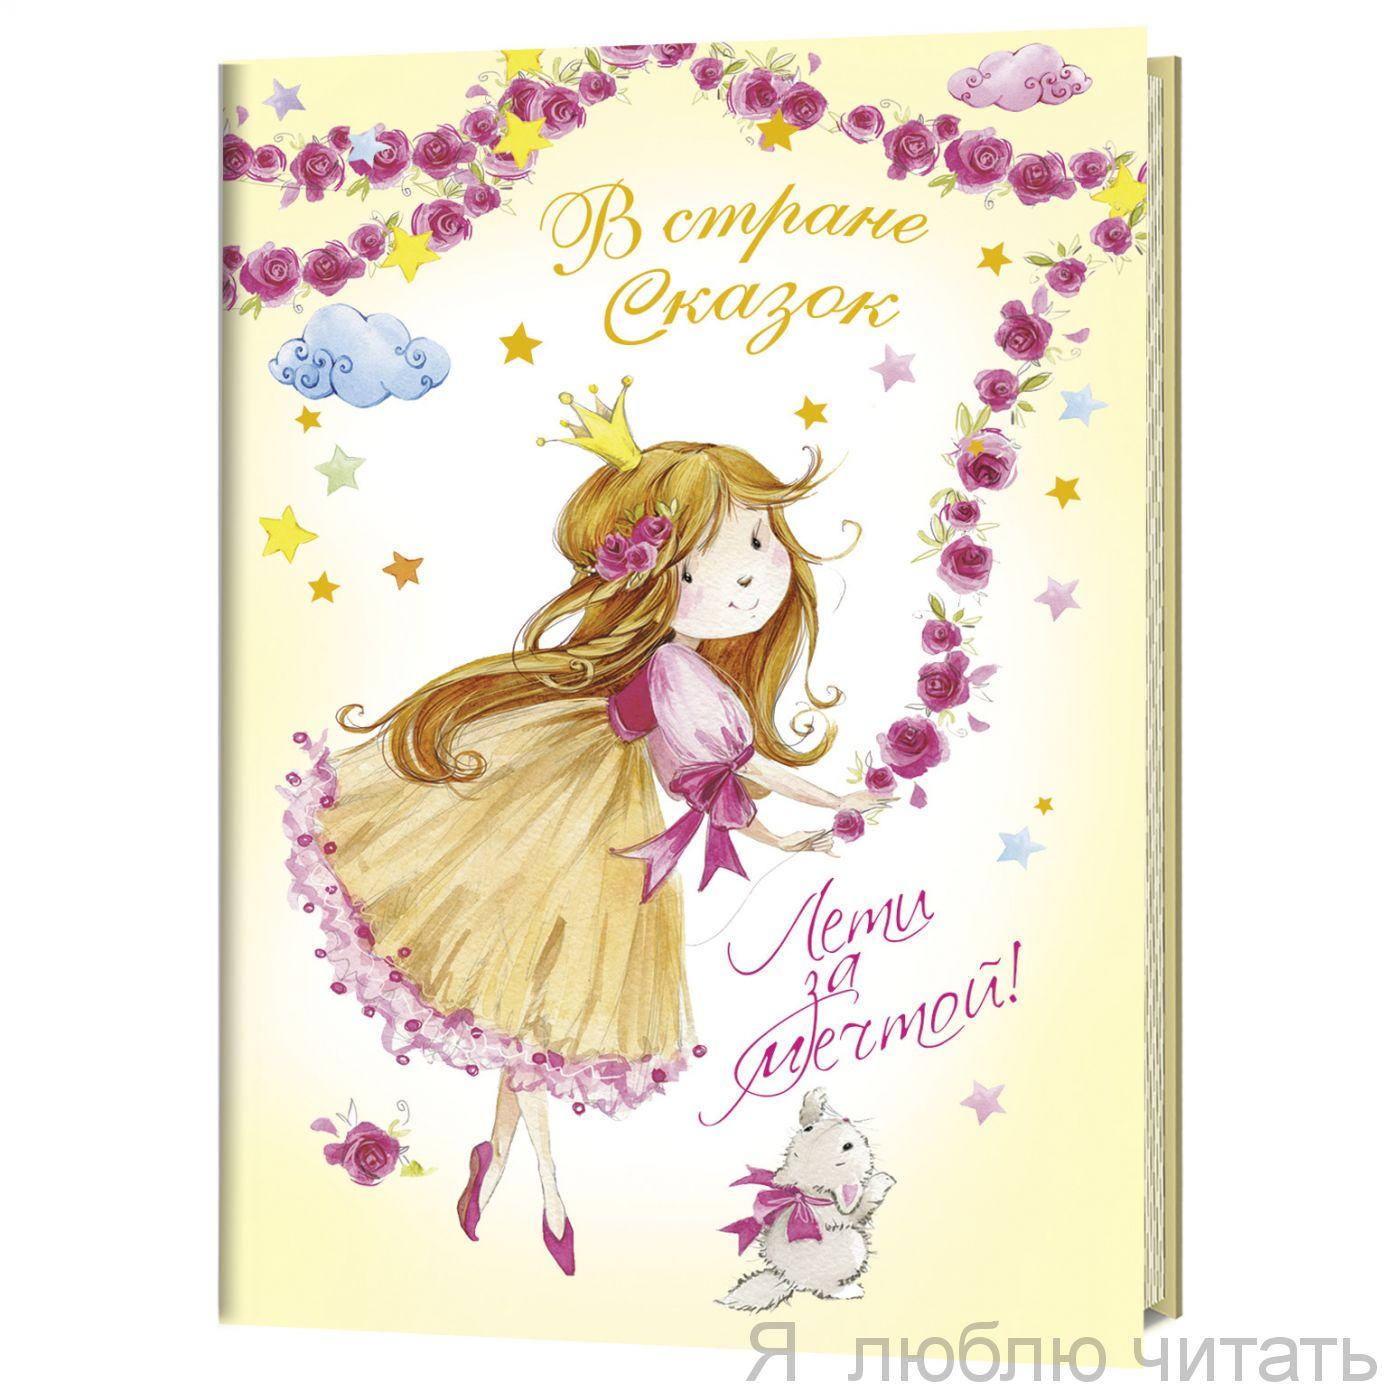 Блокнотик с принцессами. Лети за мечтой!